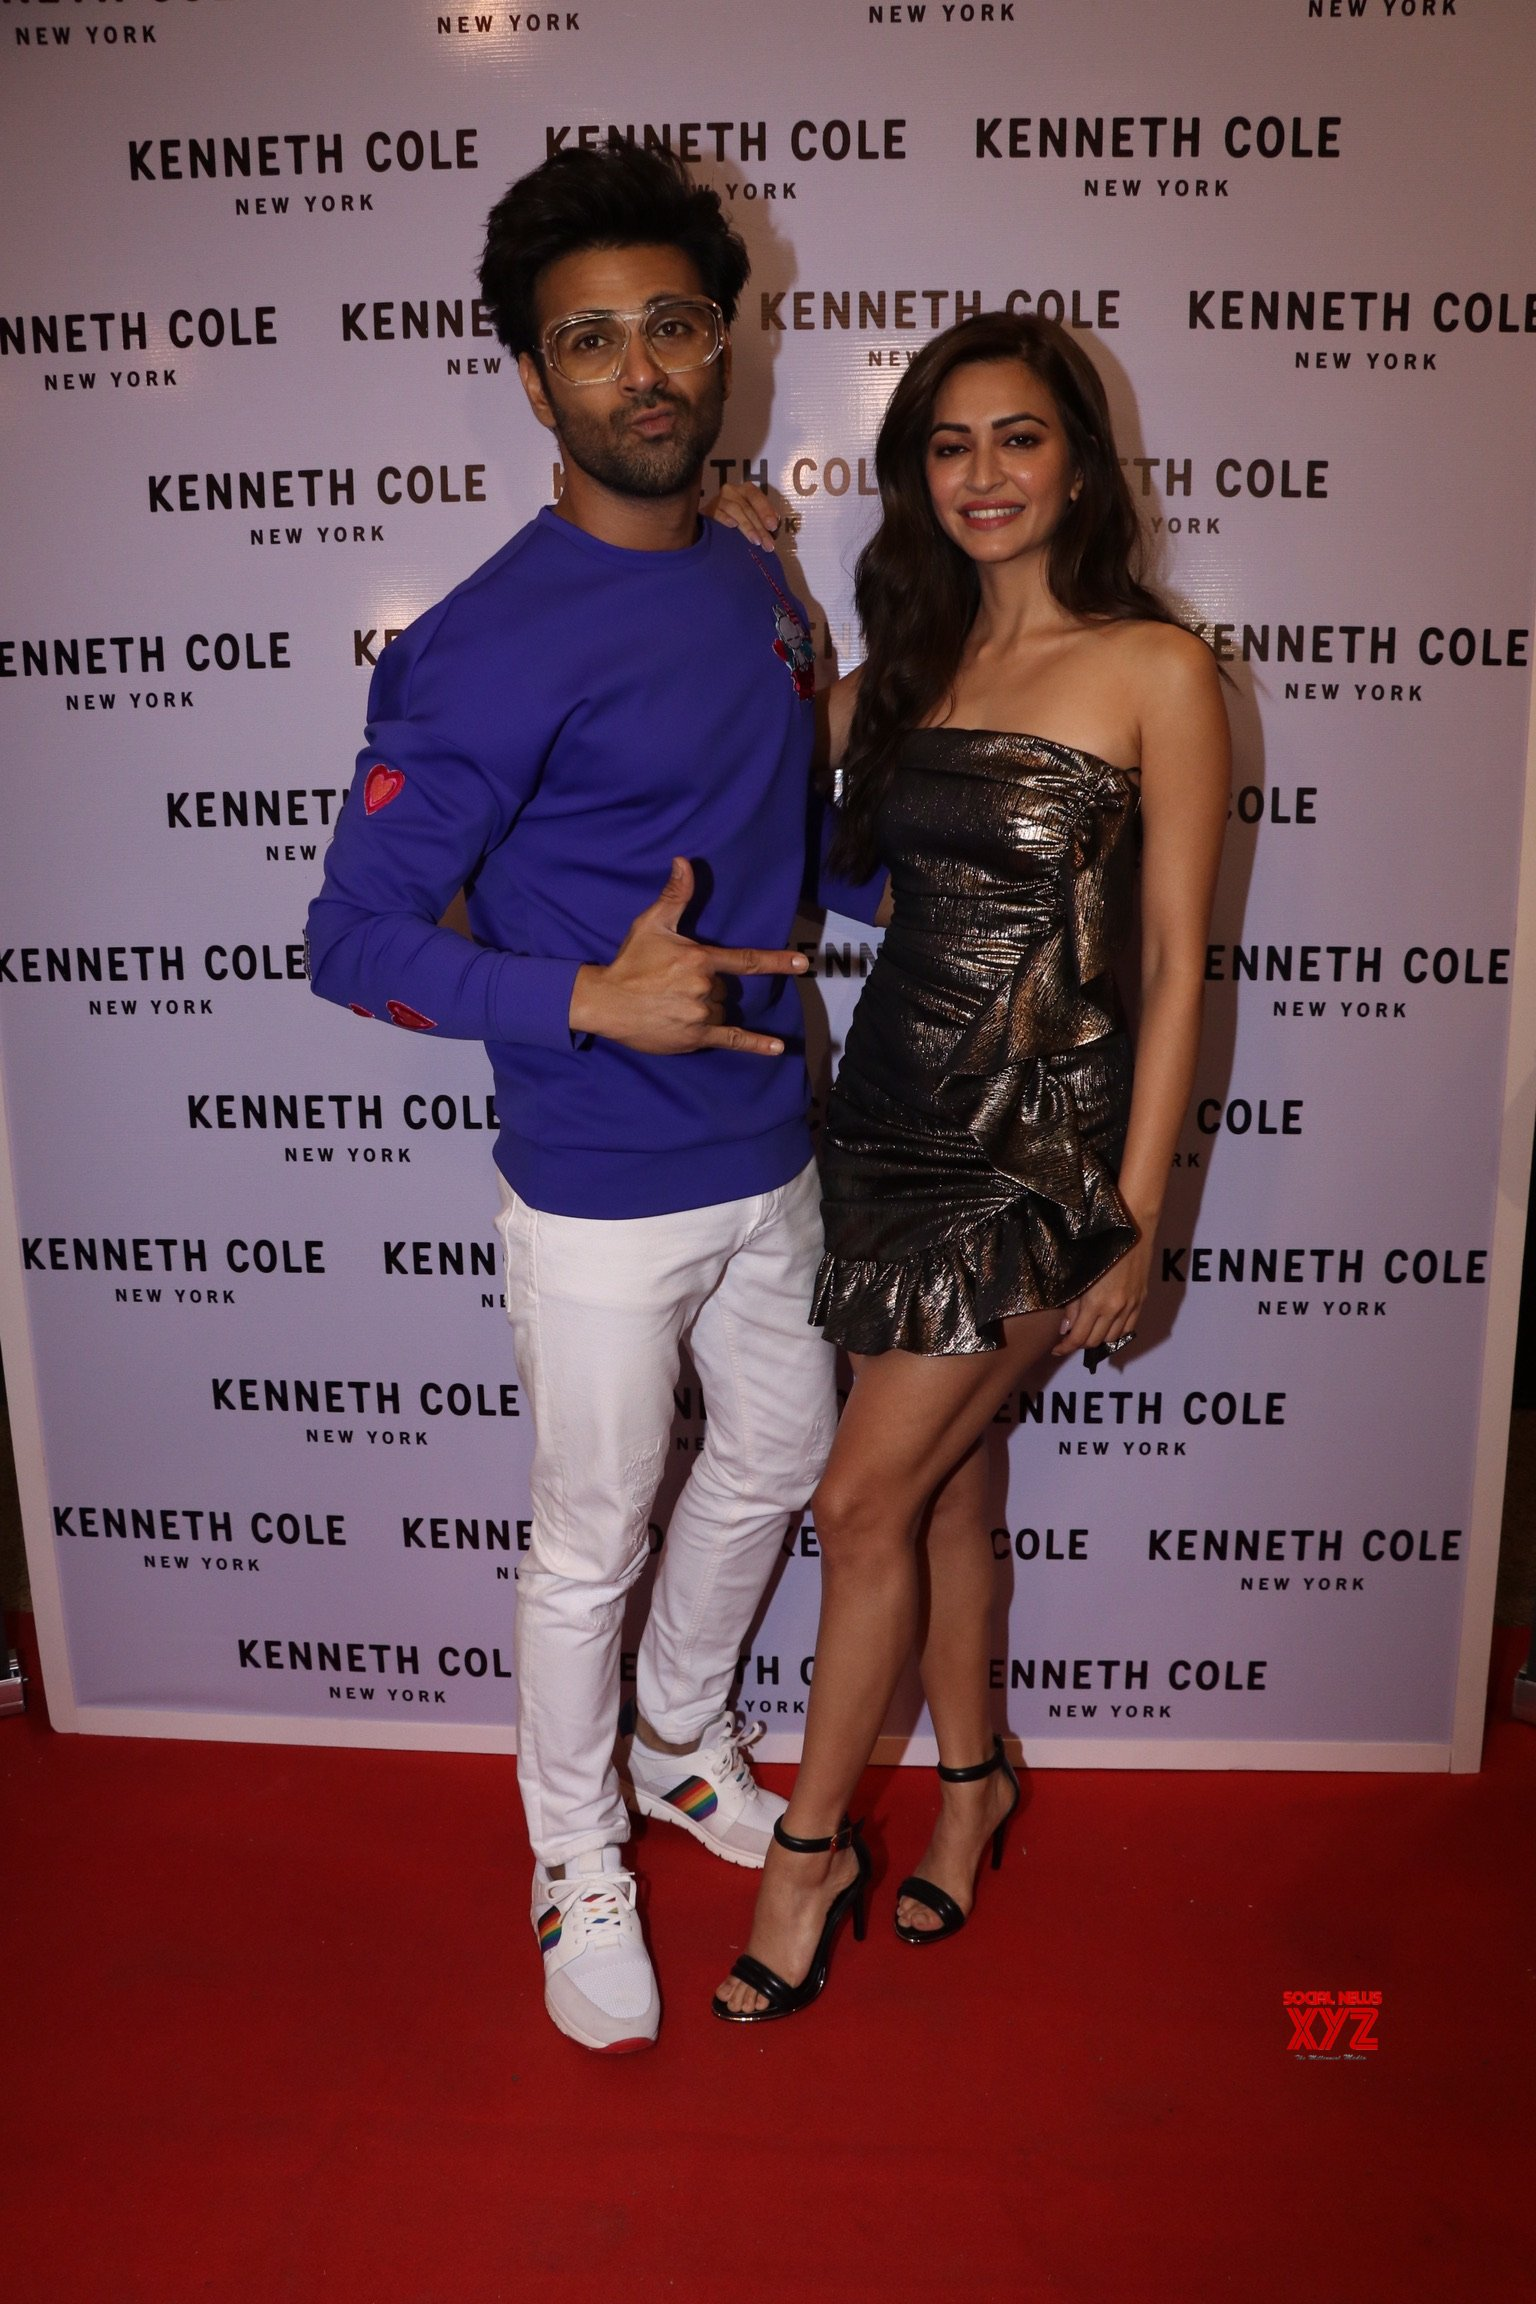 Pulkit Samrat And Kriti Kharbanda At Kenneth Cole Store Launch In Mumbai - Gallery